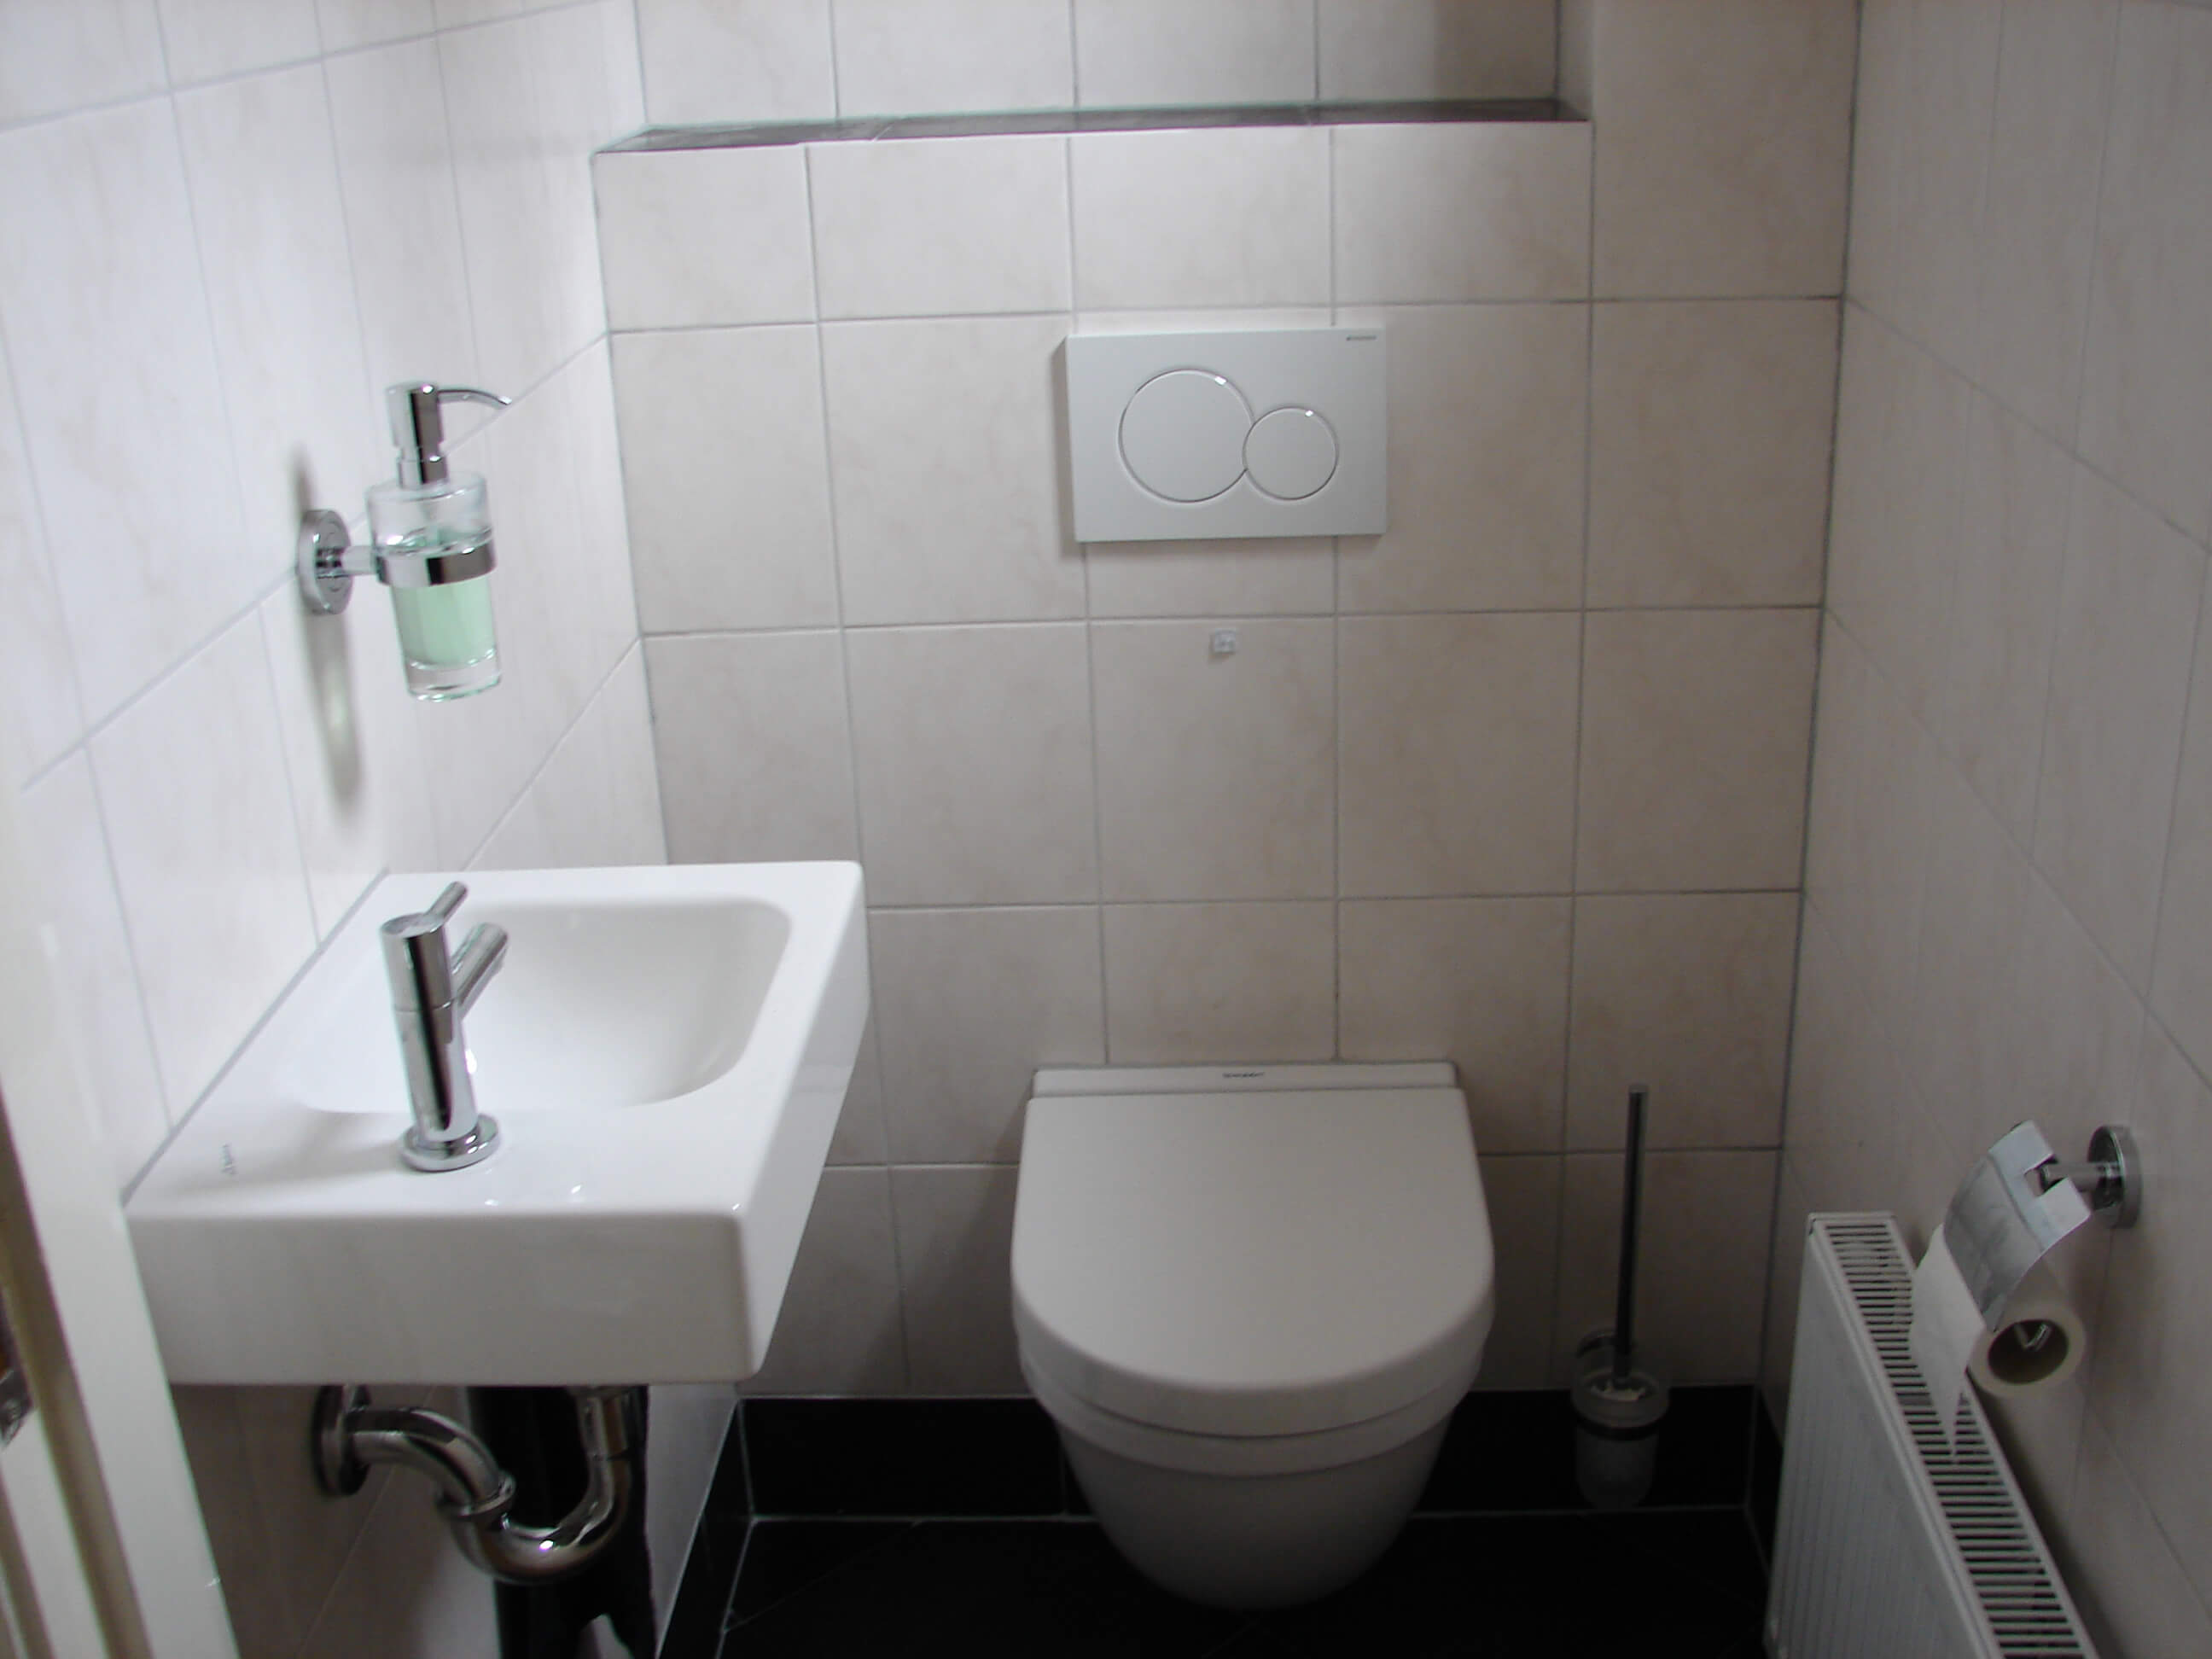 Renovatie toiletruimte 1